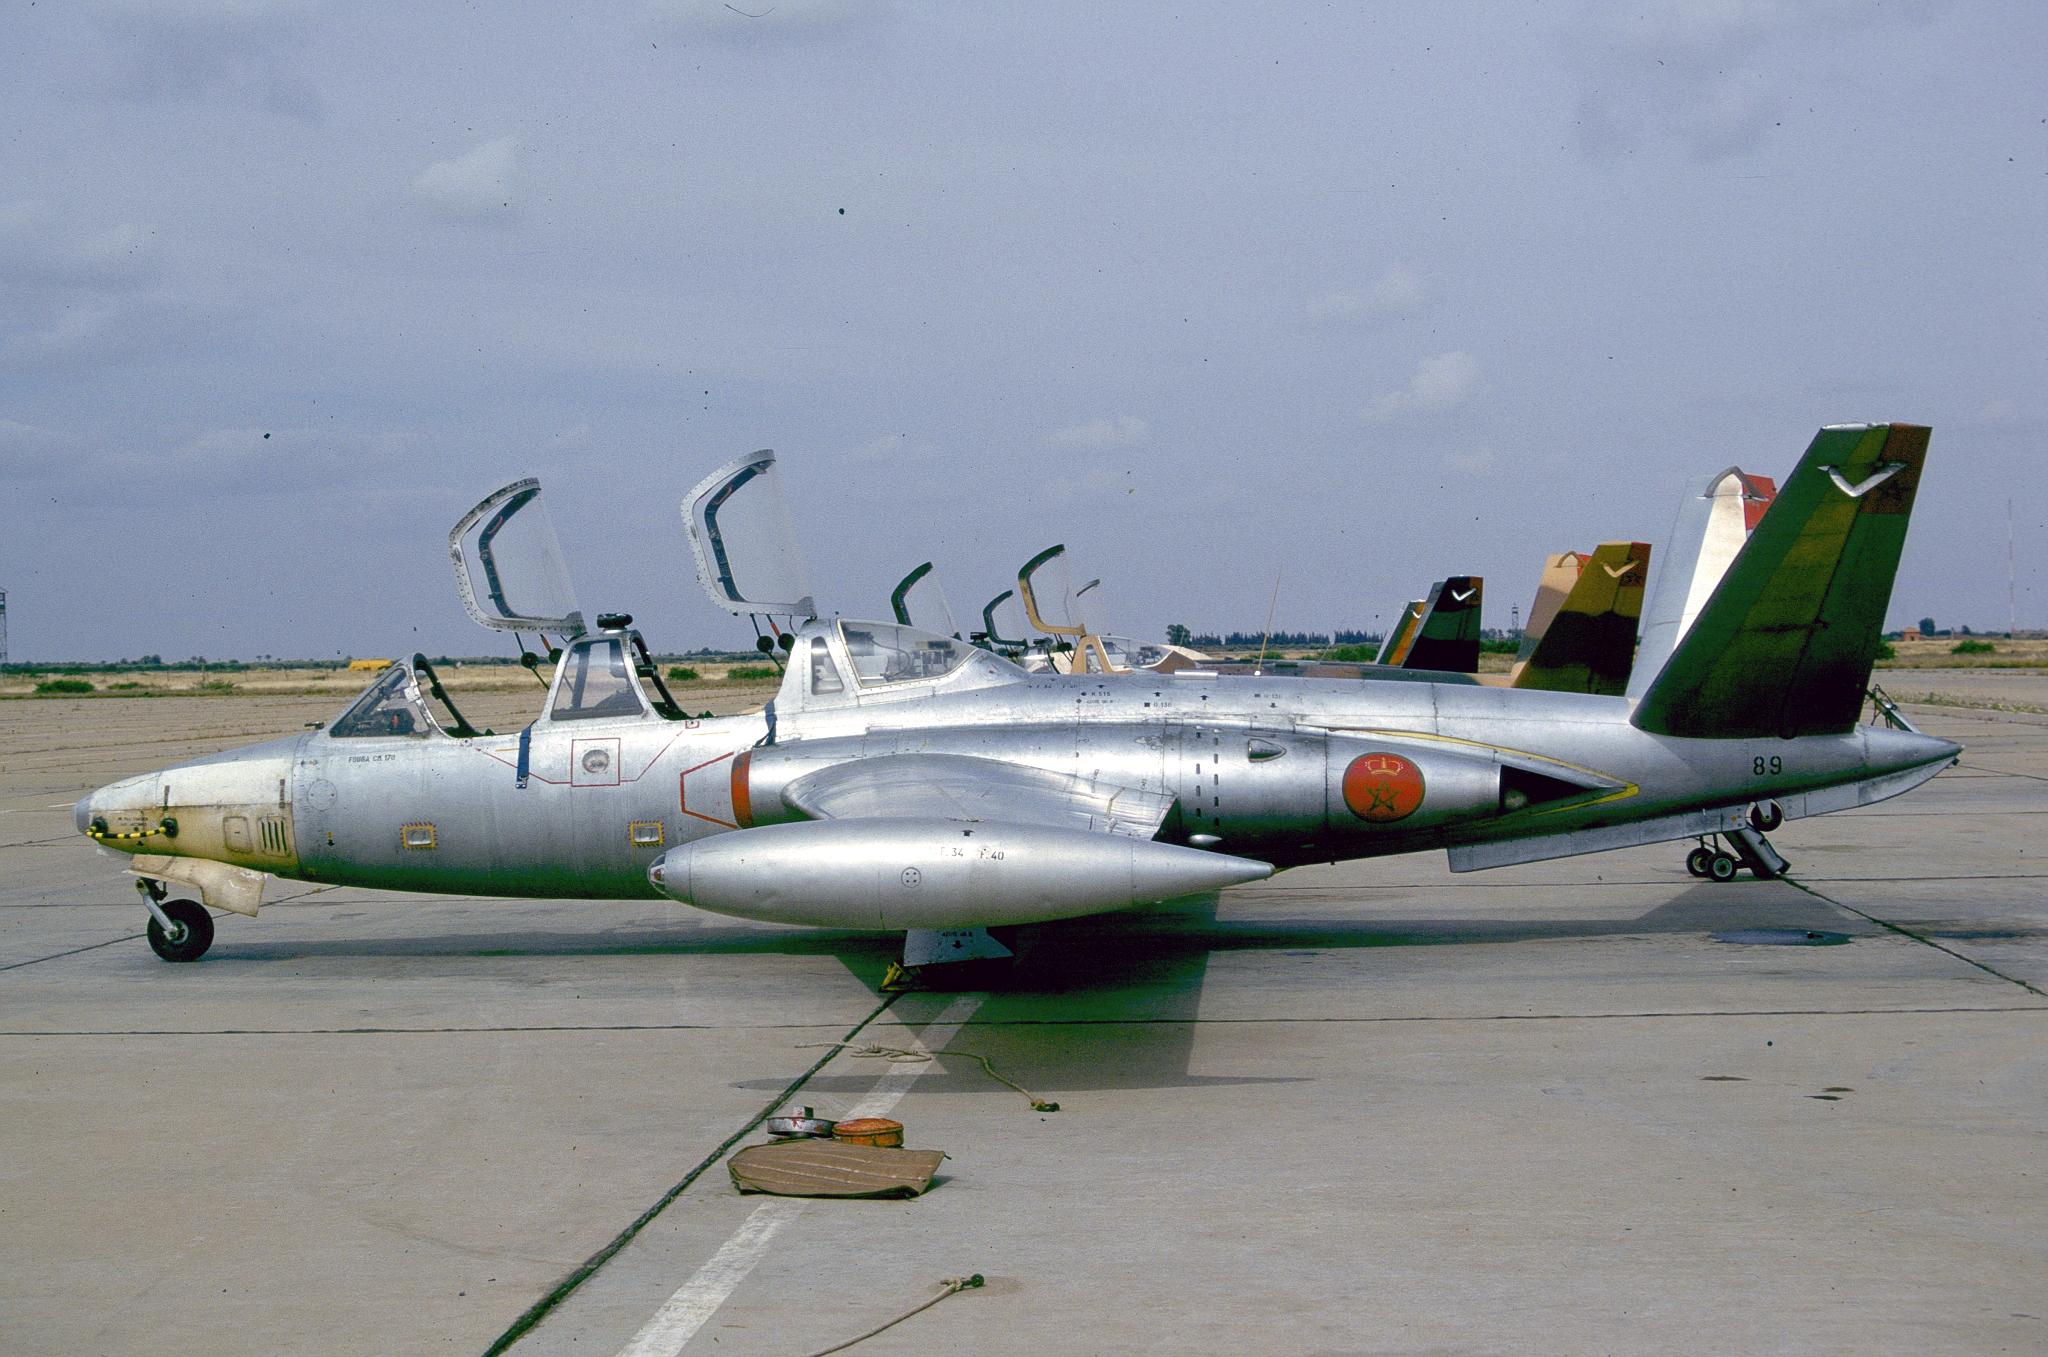 FRA: Photos anciens avions des FRA - Page 13 31221355131_52828f0d5a_o_d